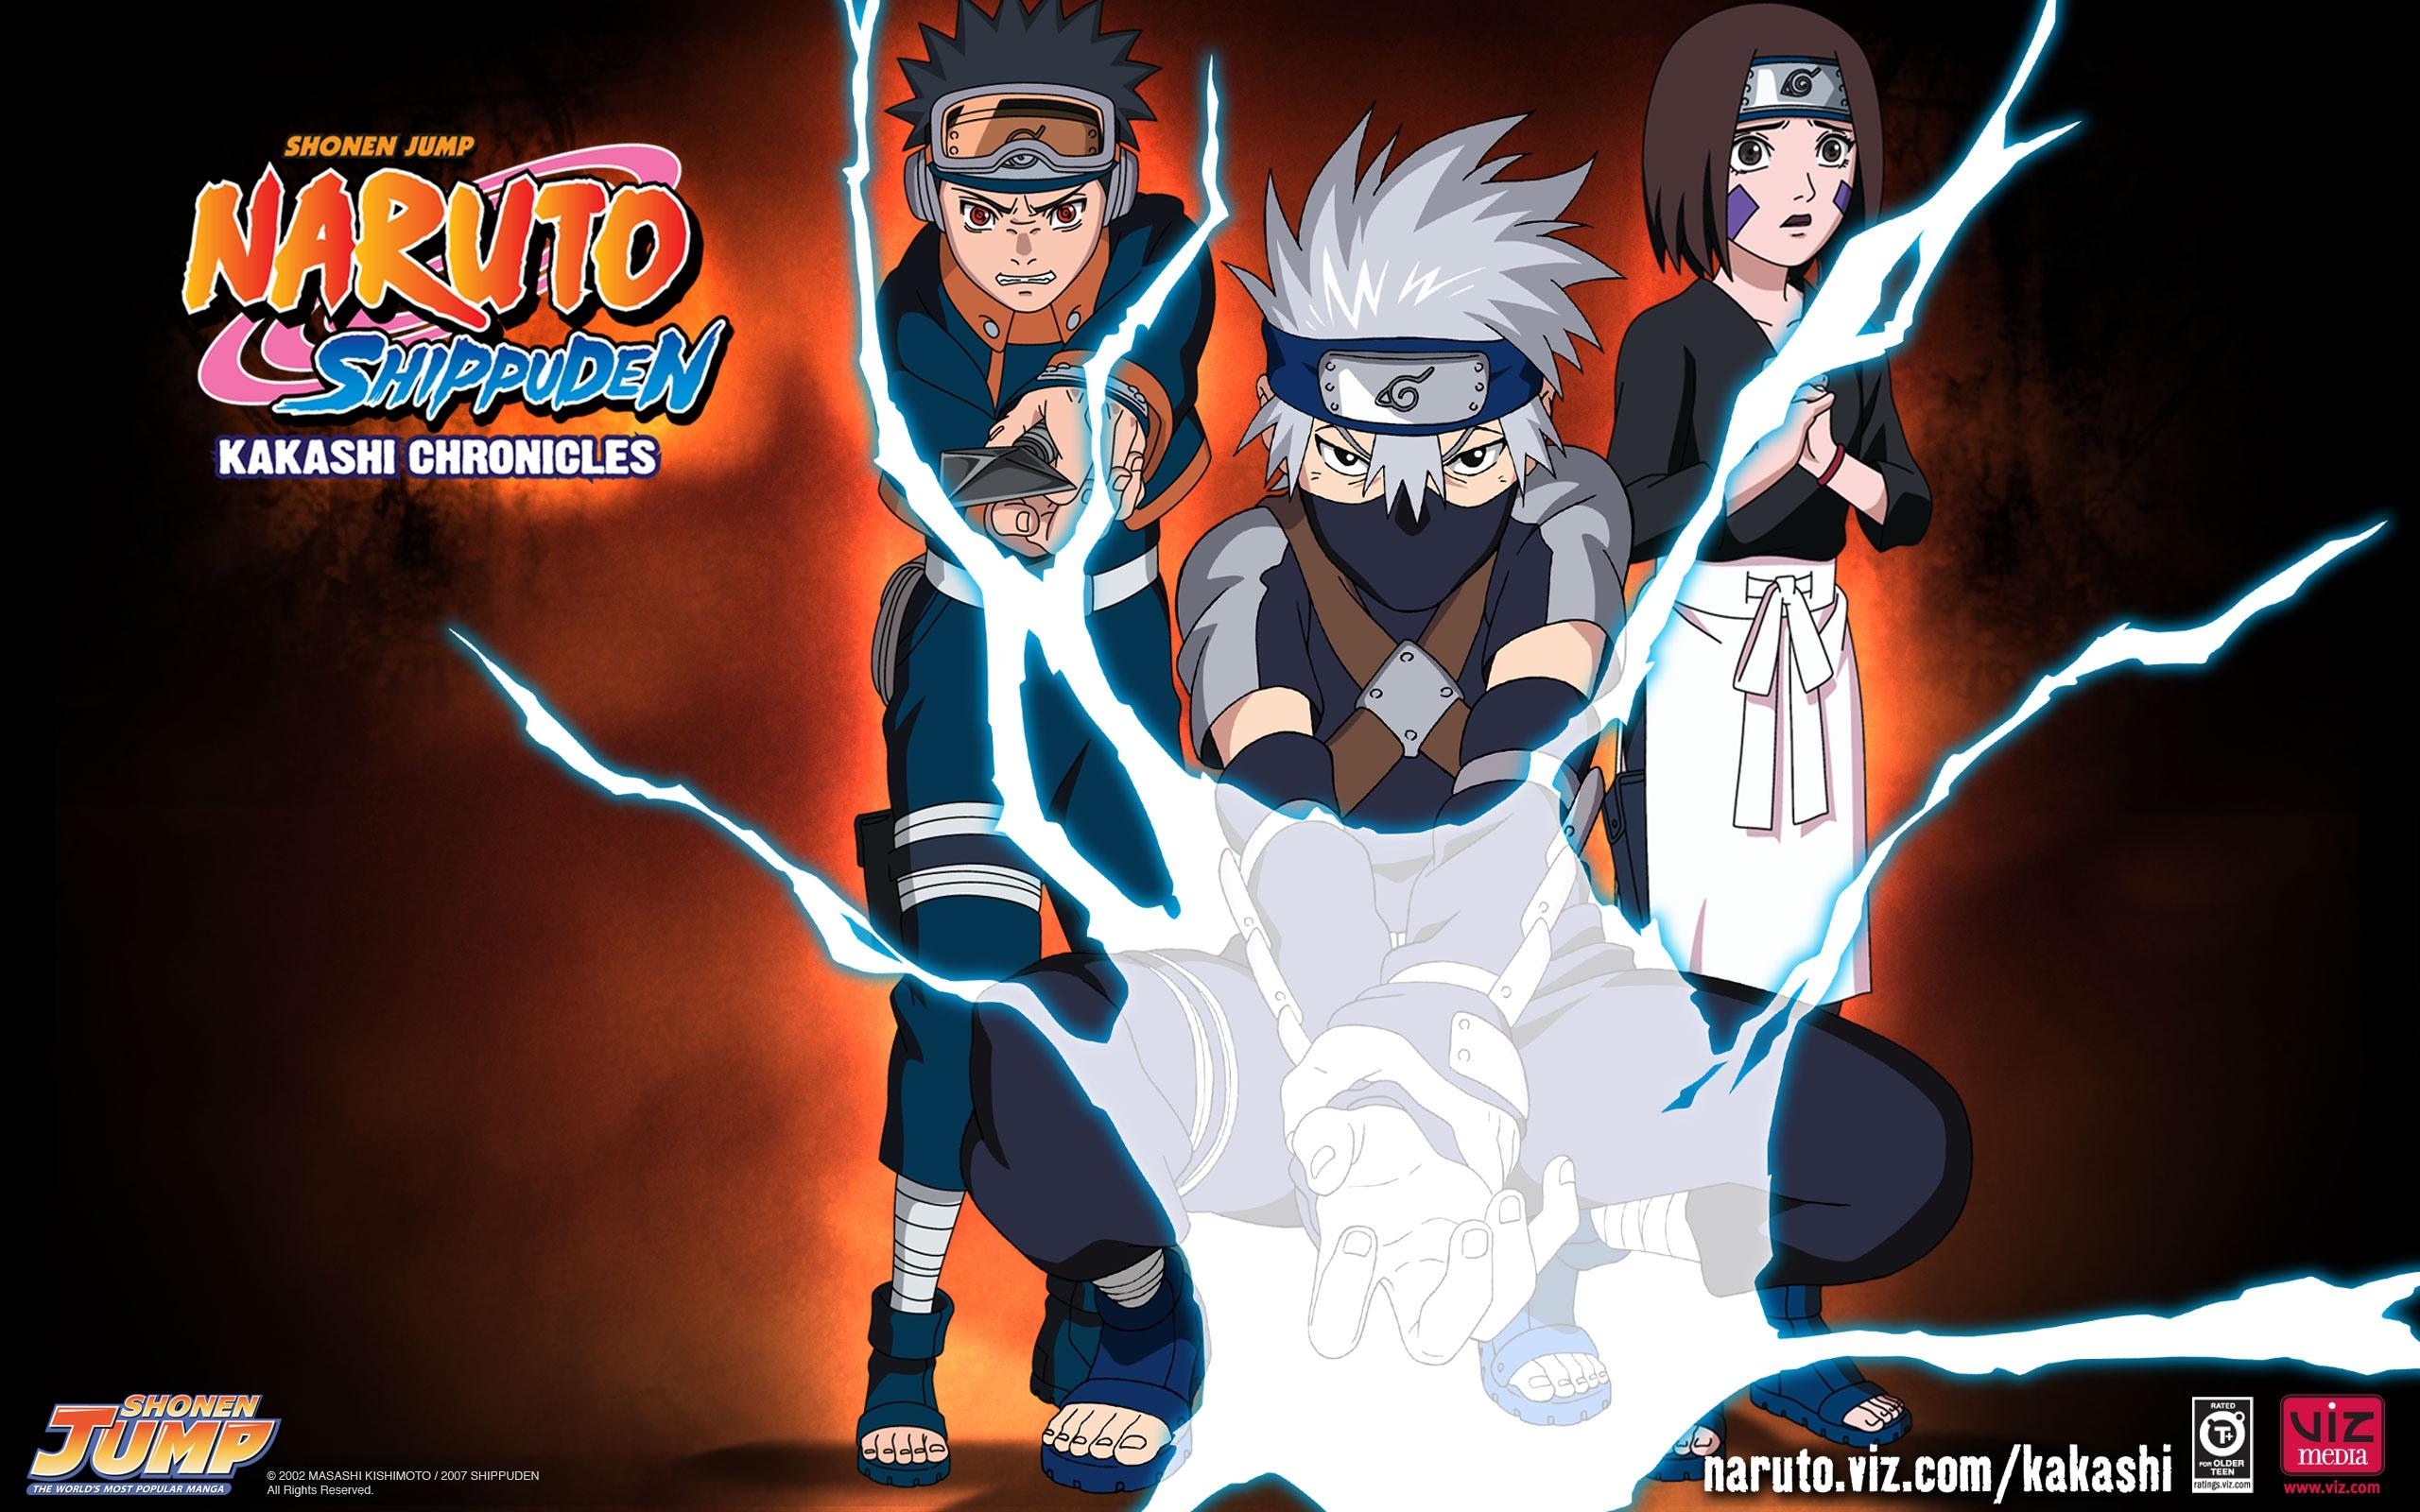 Naruto Shippuden Imagenes